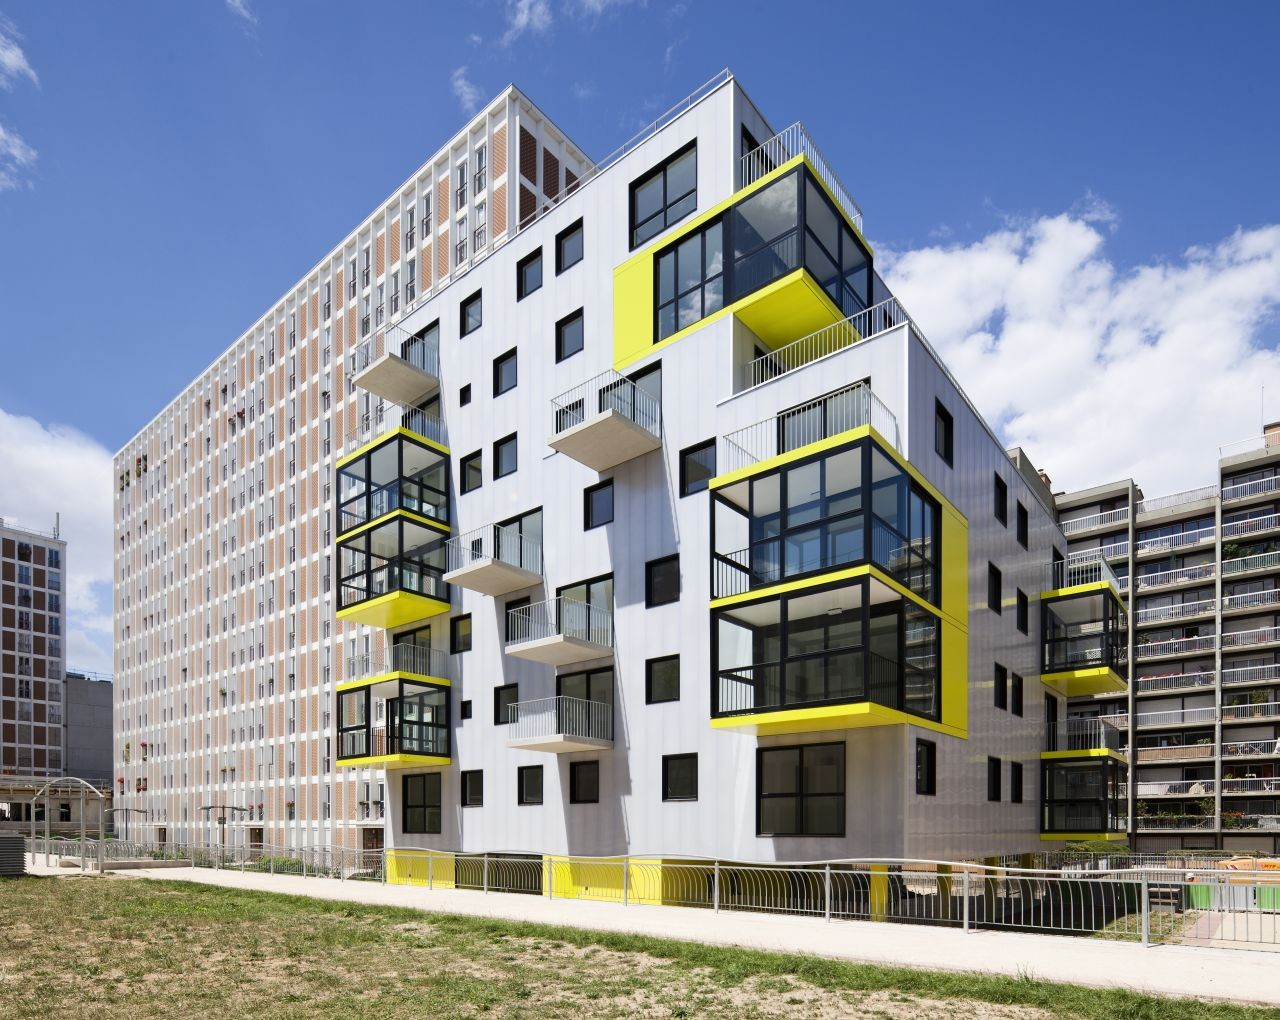 OP13 / PHD Architectes